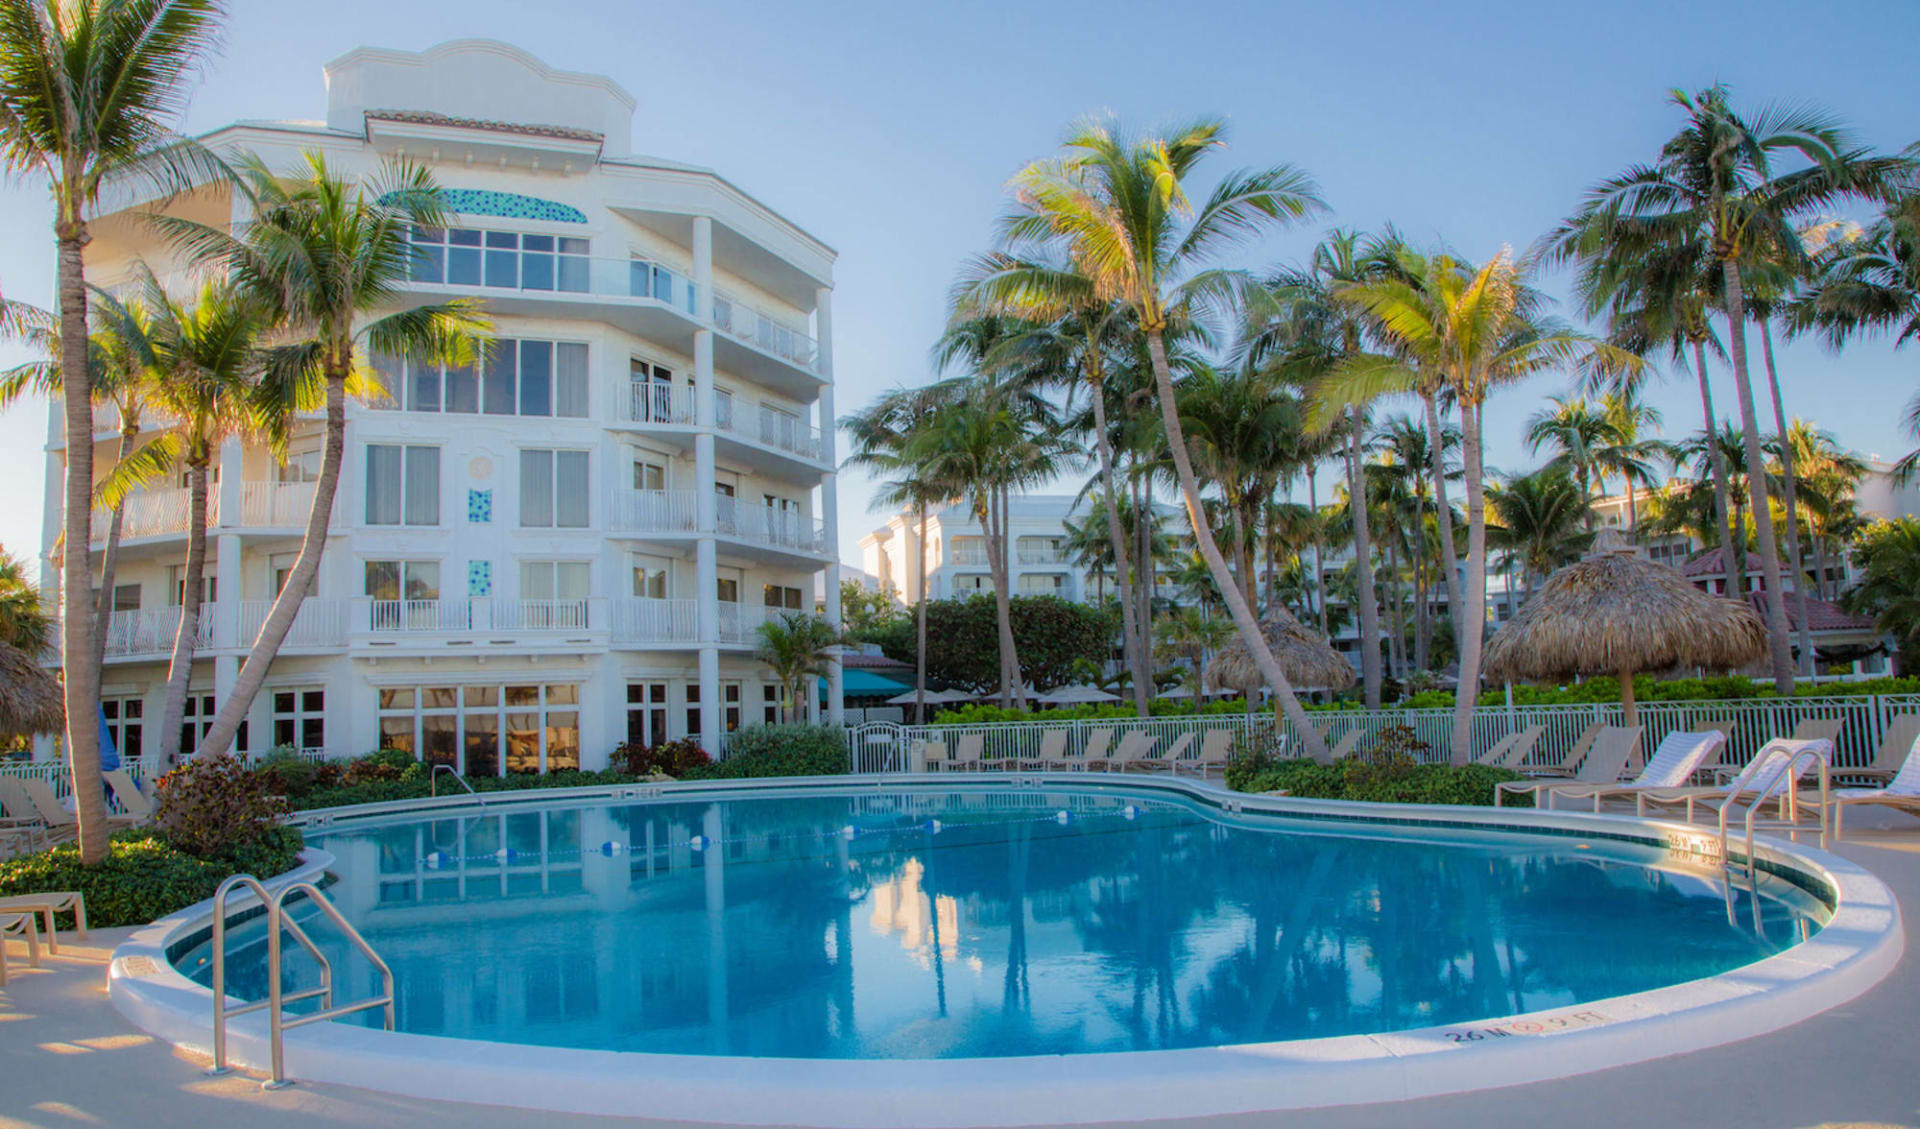 Lago Mar Resort & Club in Fort Lauderdale:  Lago Mar Fort Lauderdale_Pool_HOTELWEBSITE